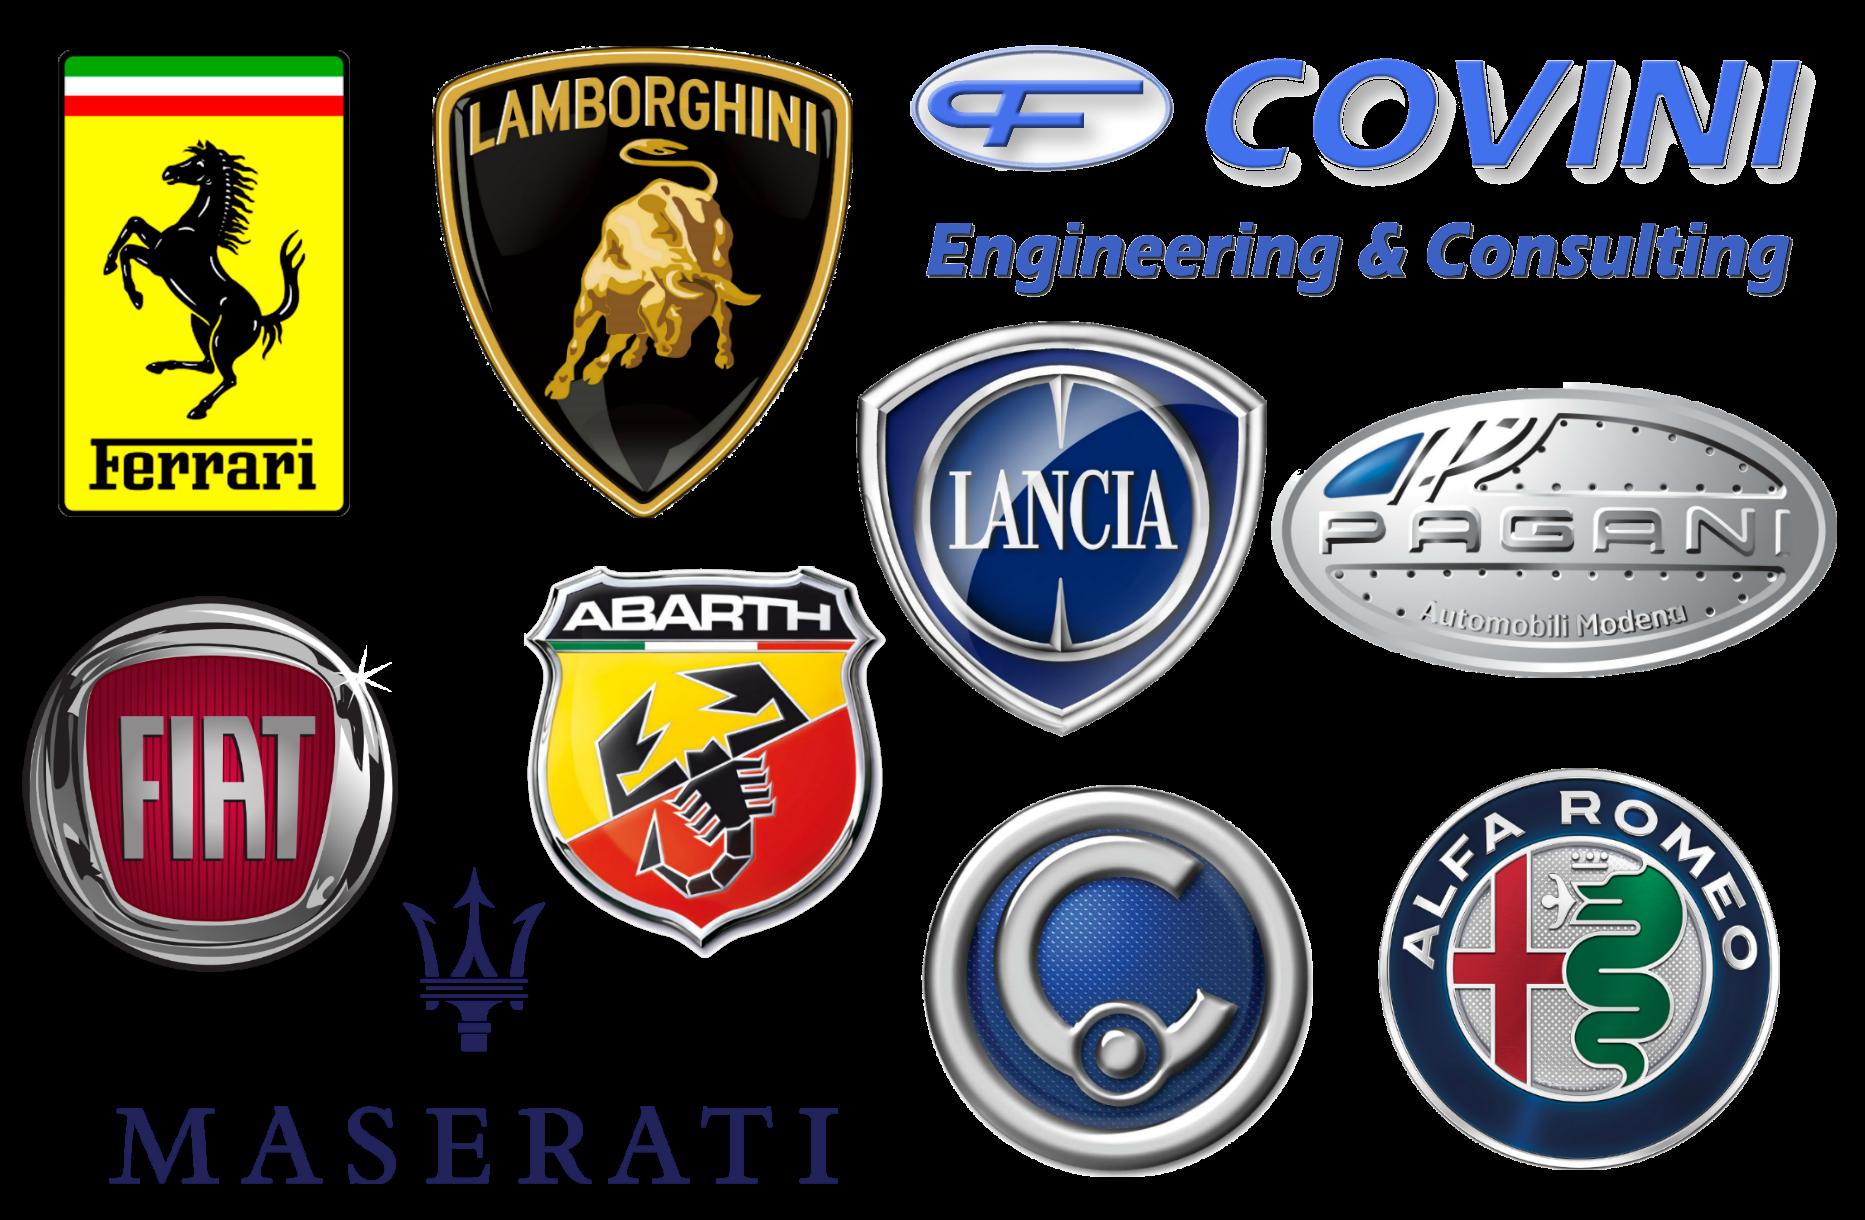 Top British Car Brands Logo European Car Brands Pinterest - Car signs and namescar logos with wings azs cars